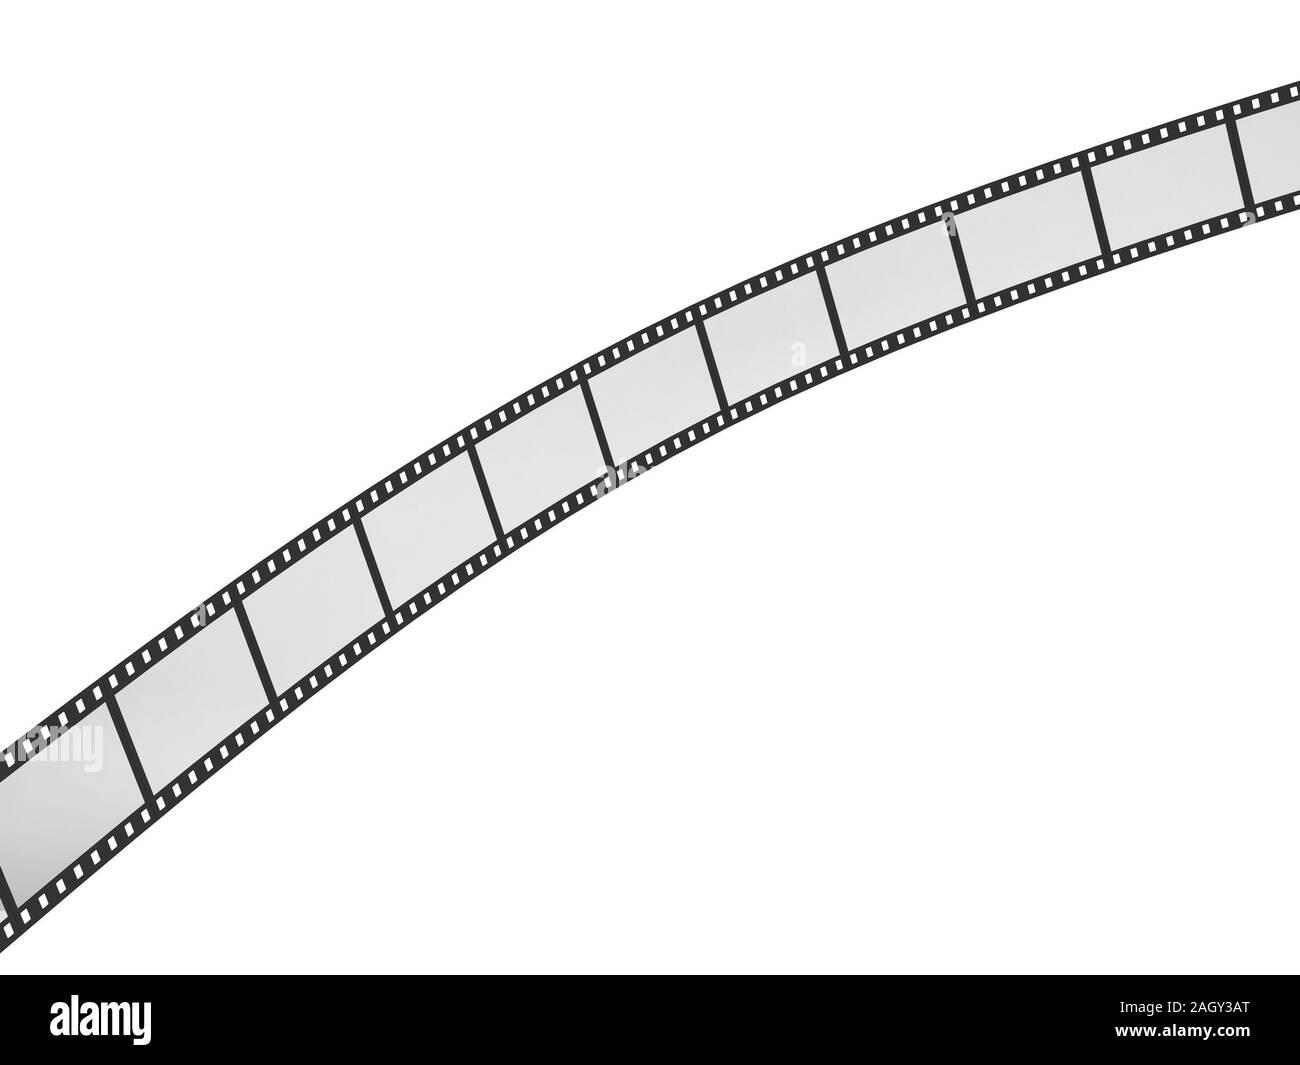 Movei film. 3d illustration isolated on white background Stock Photo